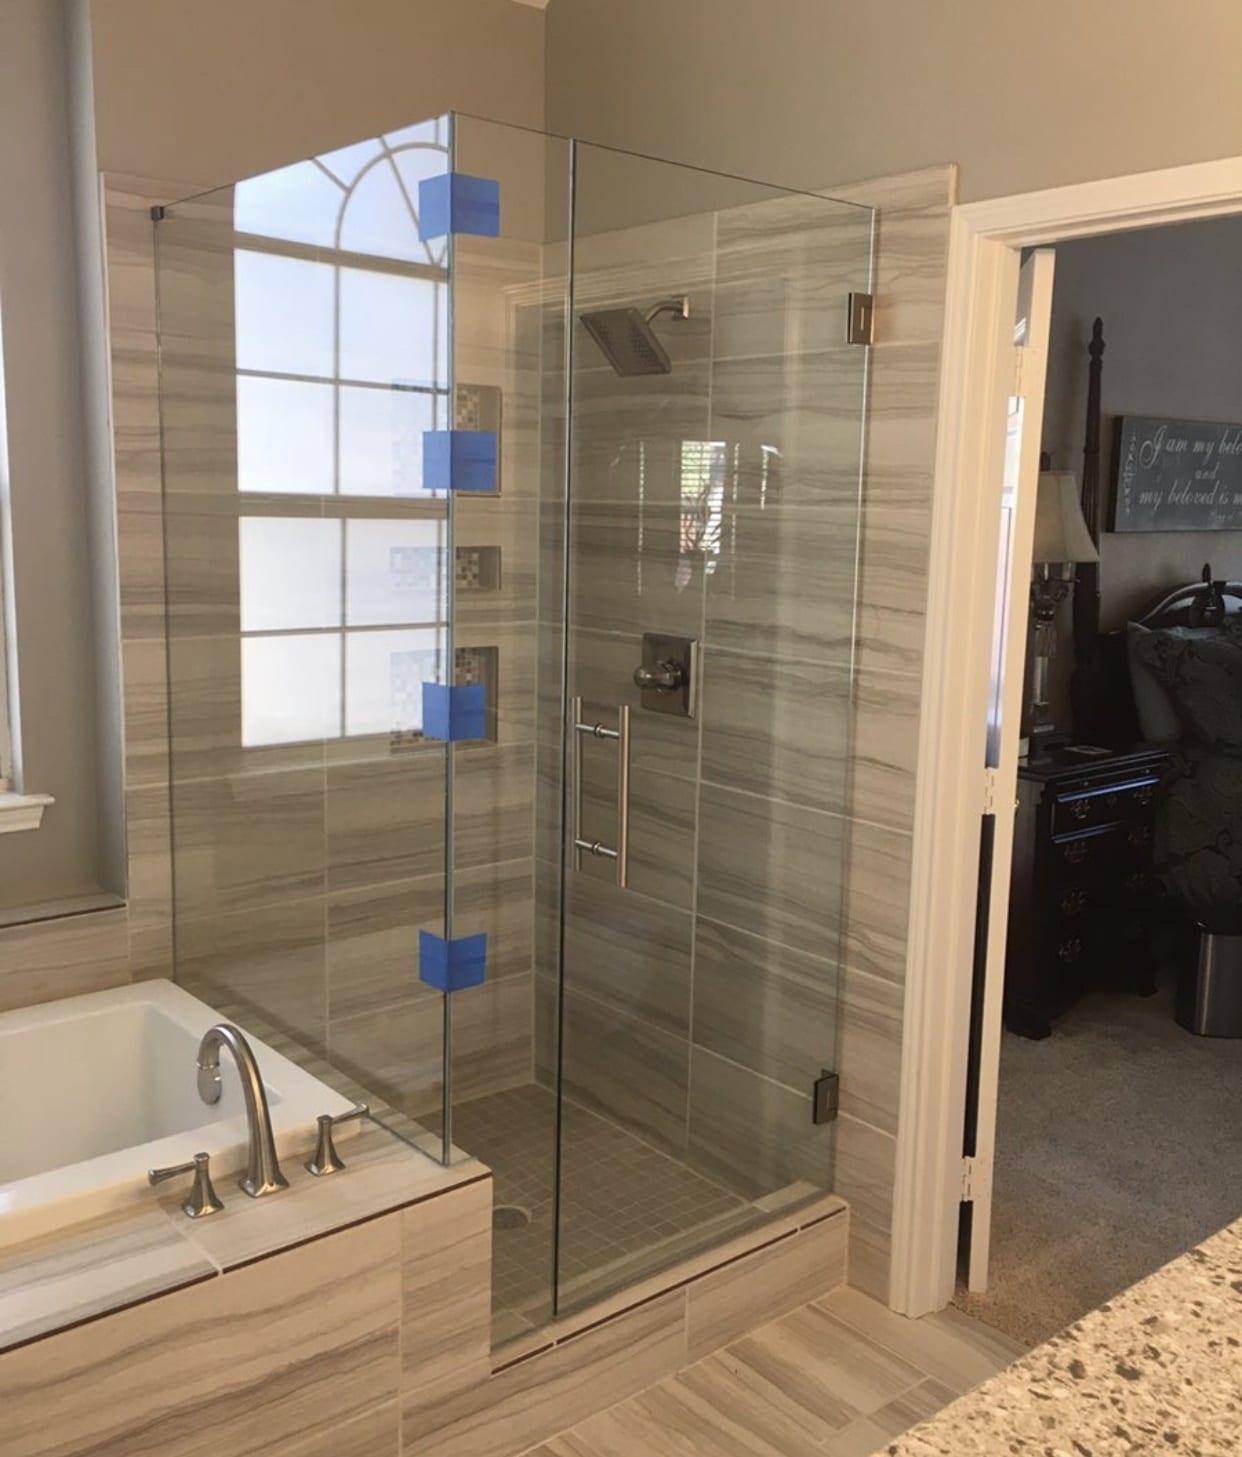 frameless shower doors img 2160 custom bathroom mirrors and decorative glass from Shower Doors of Nashville